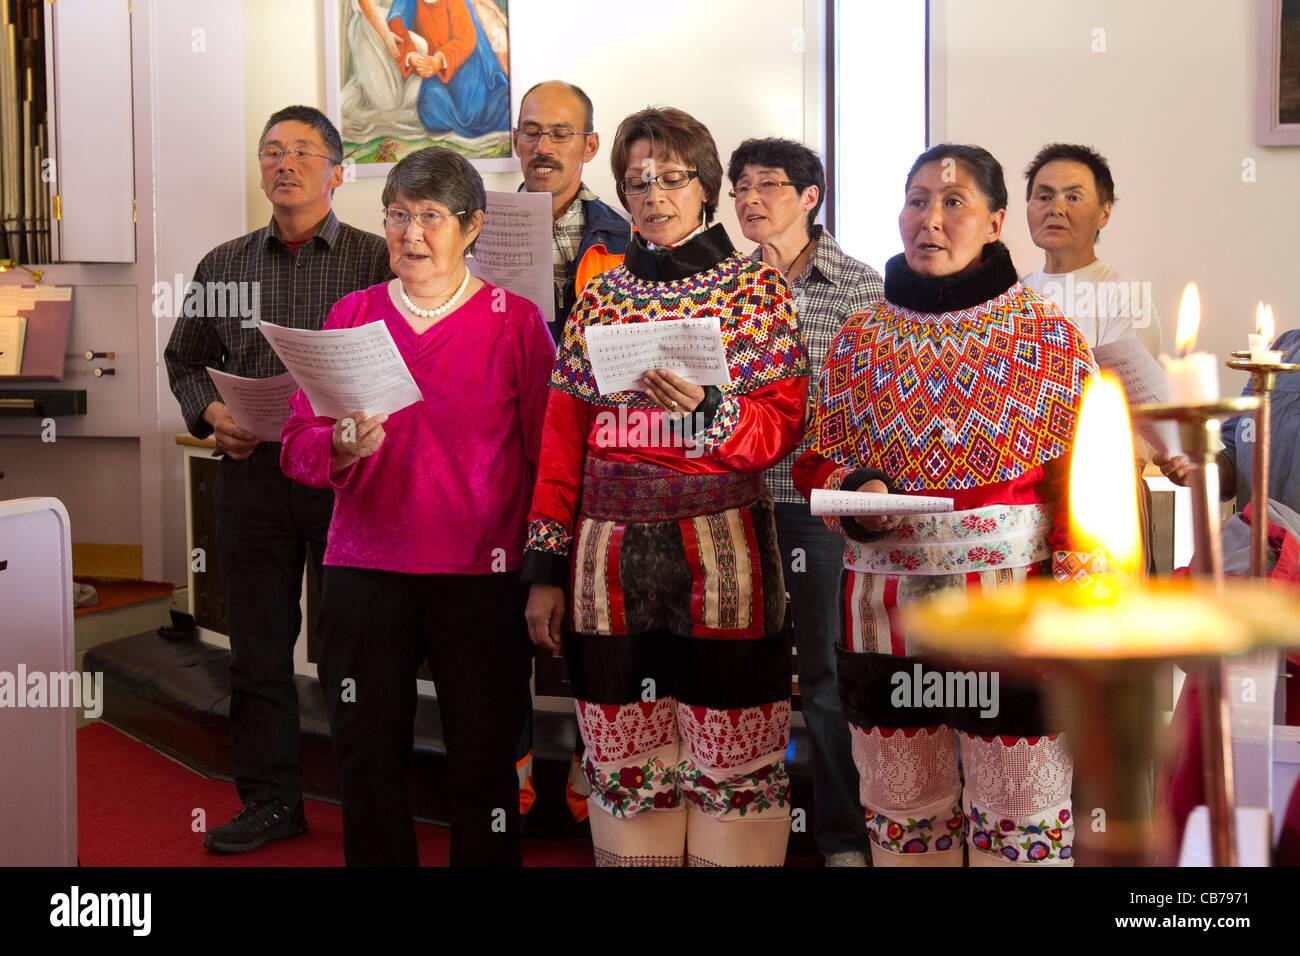 church choir, Kangaamiut, Greenland - Stock Image